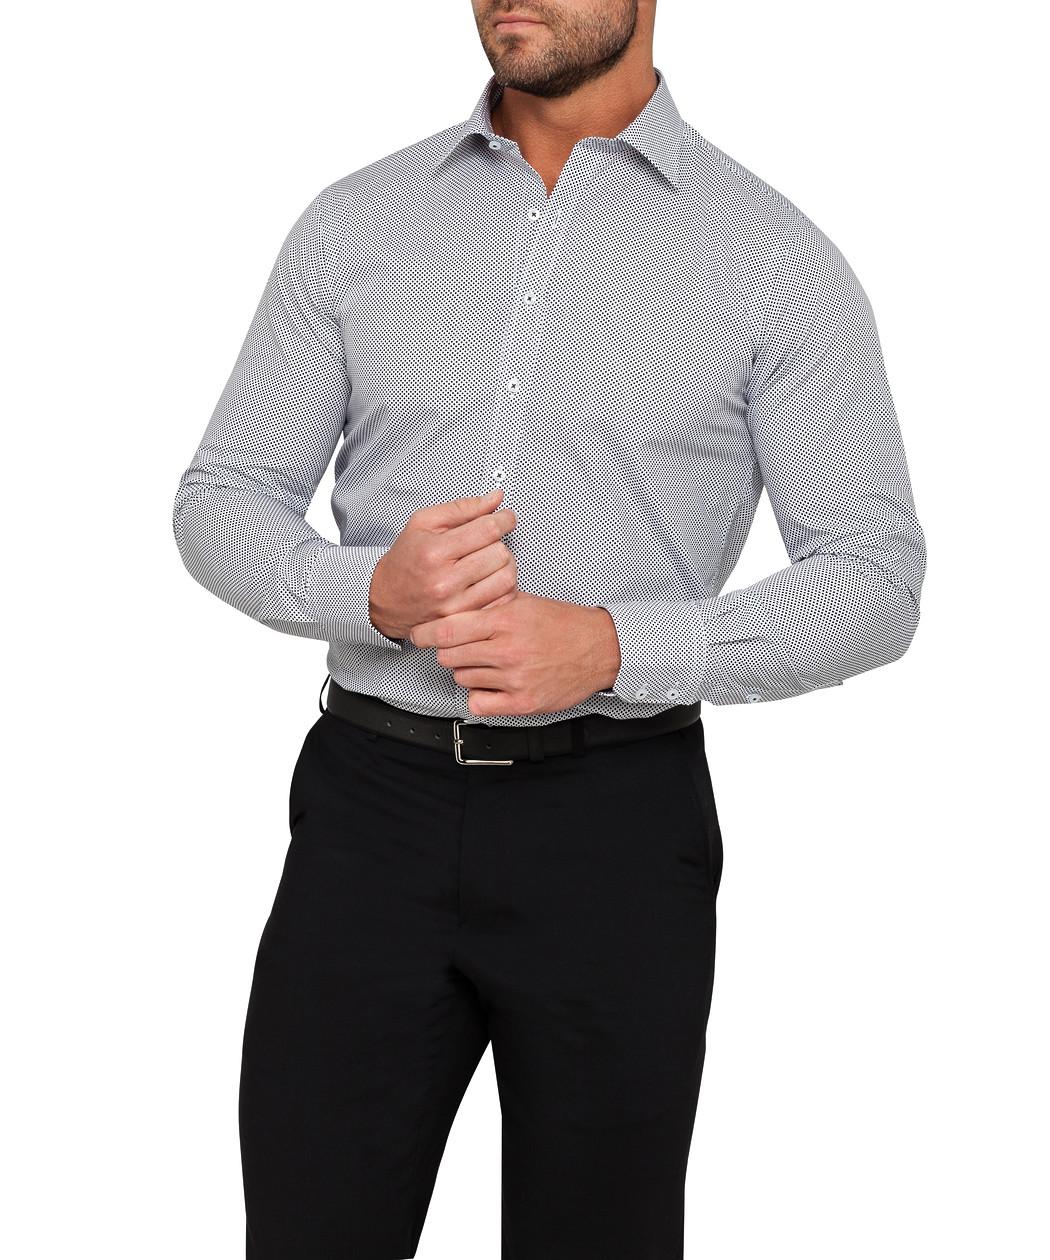 fce064bbae9d61 Mens Euro Fit Shirt White with Black Dot Print | Van Heusen Business ...